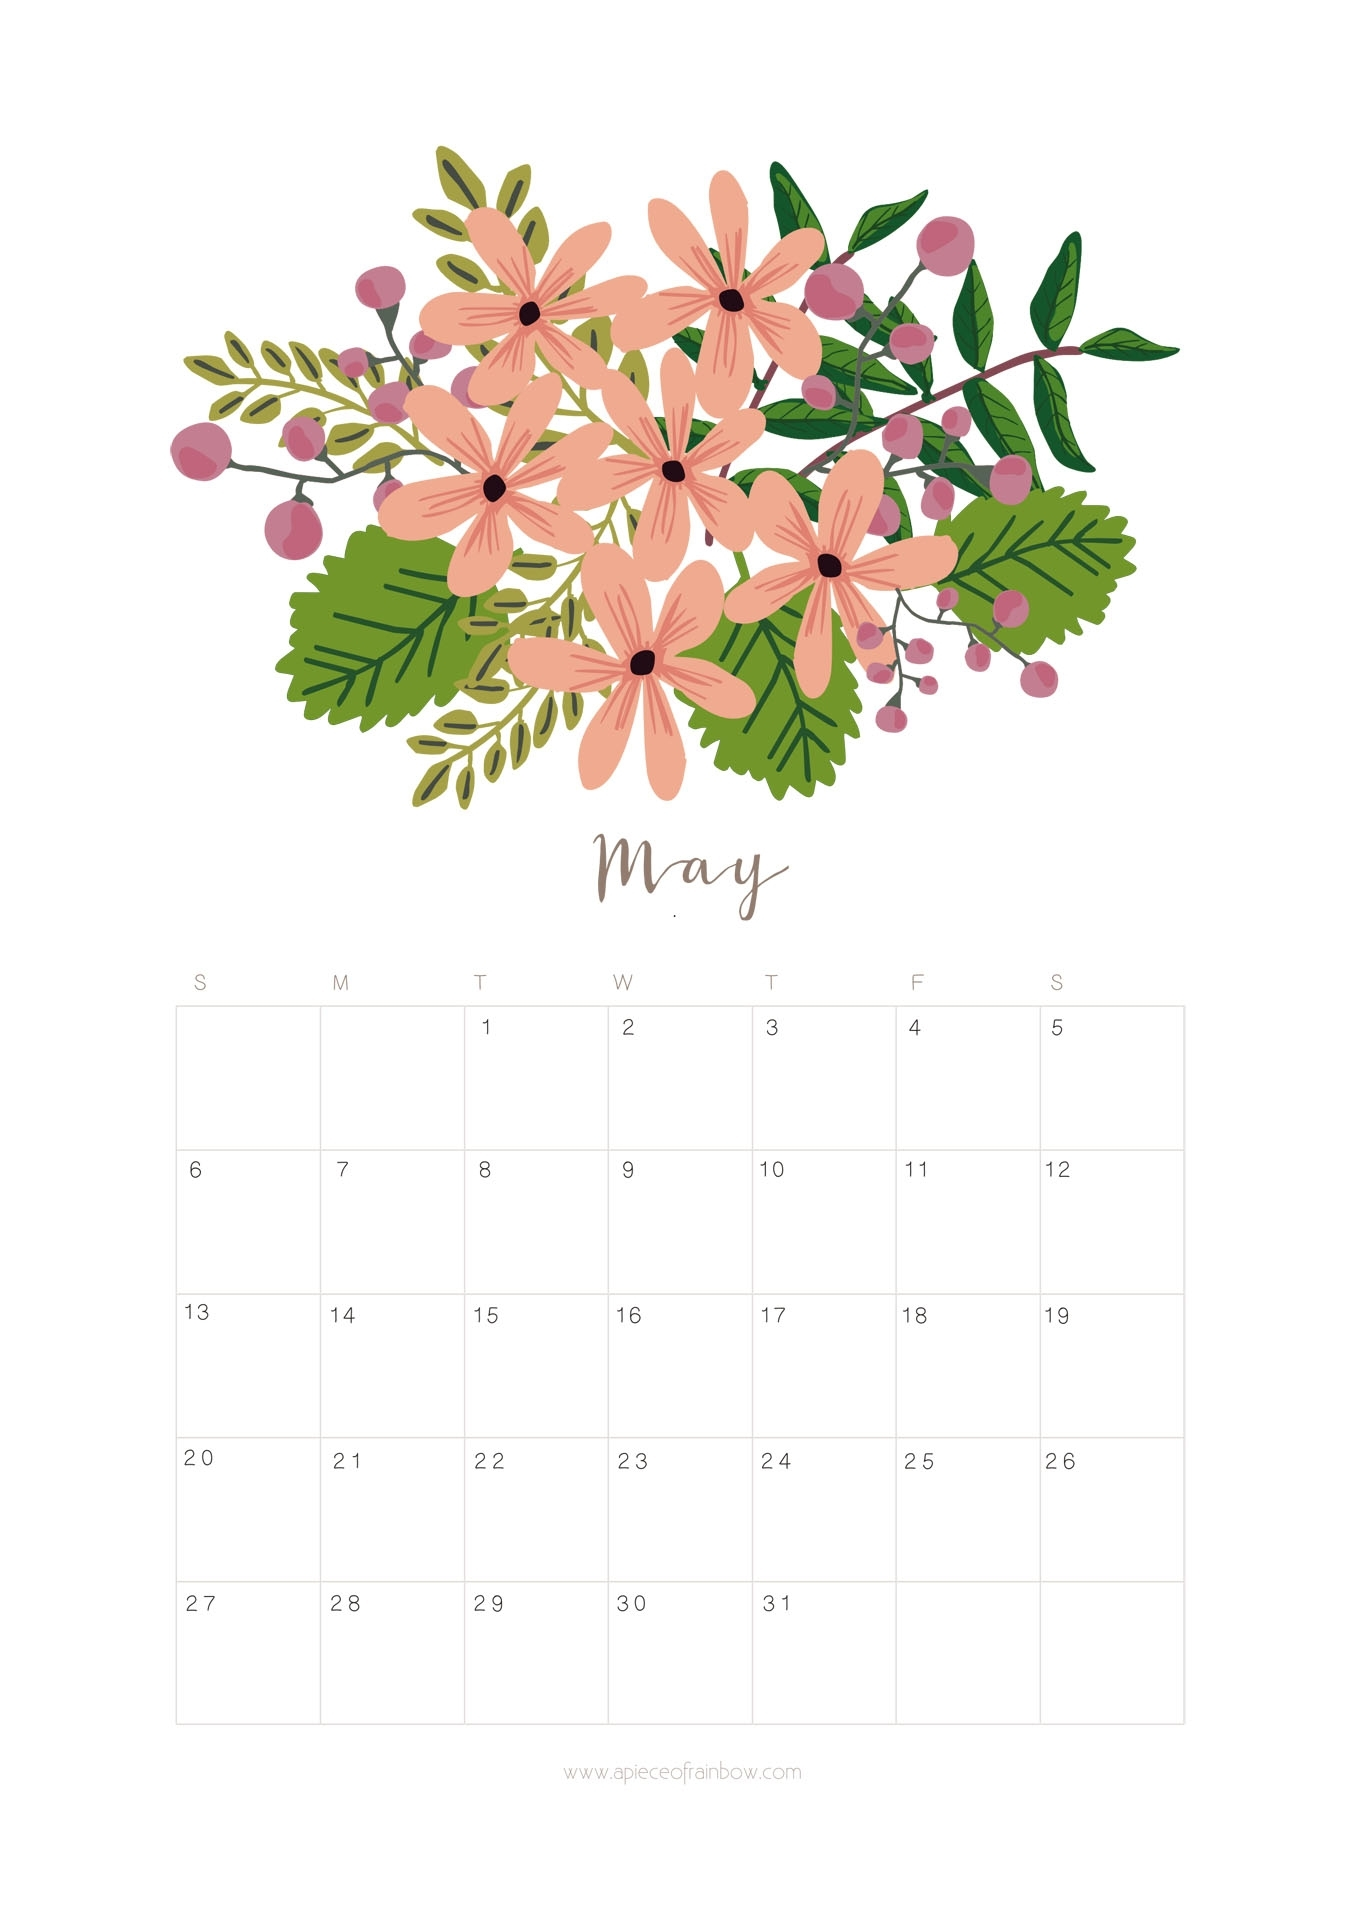 Printable May 2018 Calendar Monthly Planner - Flower Design